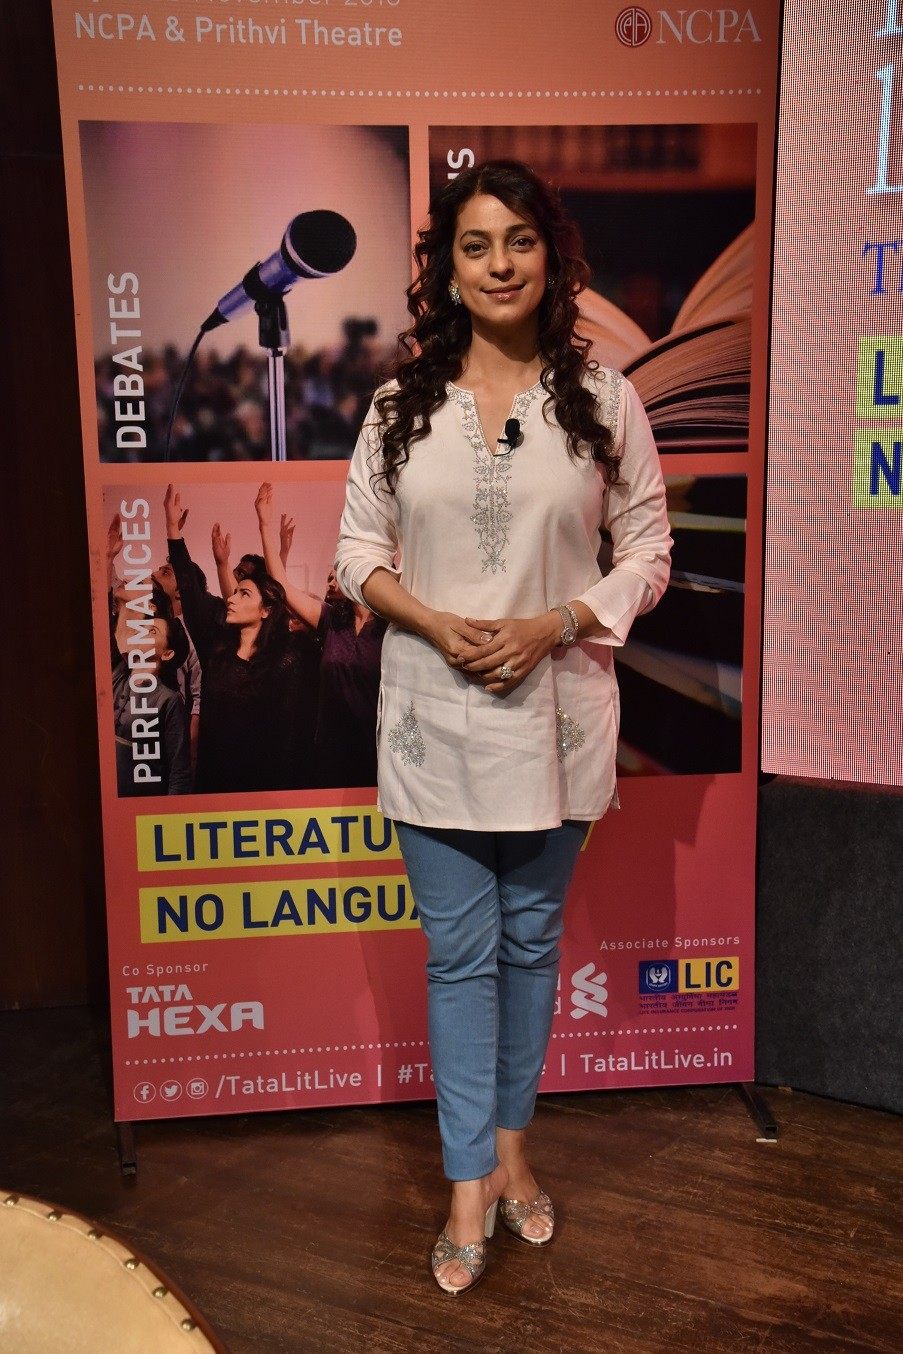 Juhi Chawla,Akshay Manwani,Shantanu Roy Chaudhuri,Deepa Gahlot,Tata Literature Live,The Mumbai LitFest